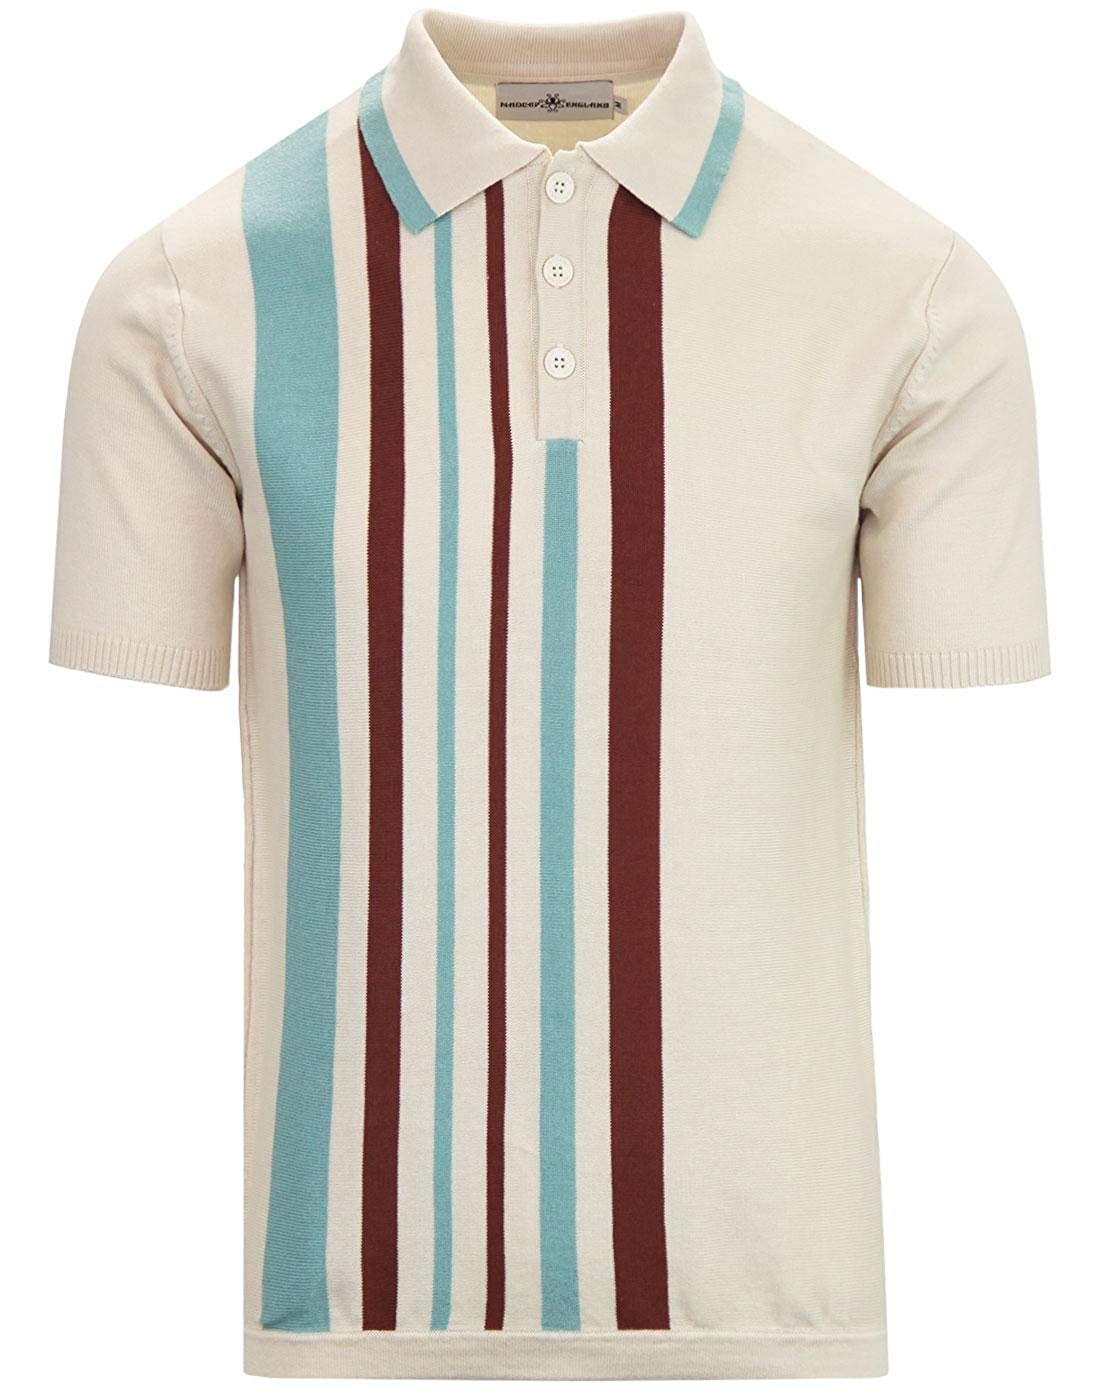 Vintage Inspired Dresses & Clothing UK Madcap England Bauhaus Mens Mod 50s 60s Style Knitted Polo Shirt £34.99 AT vintagedancer.com